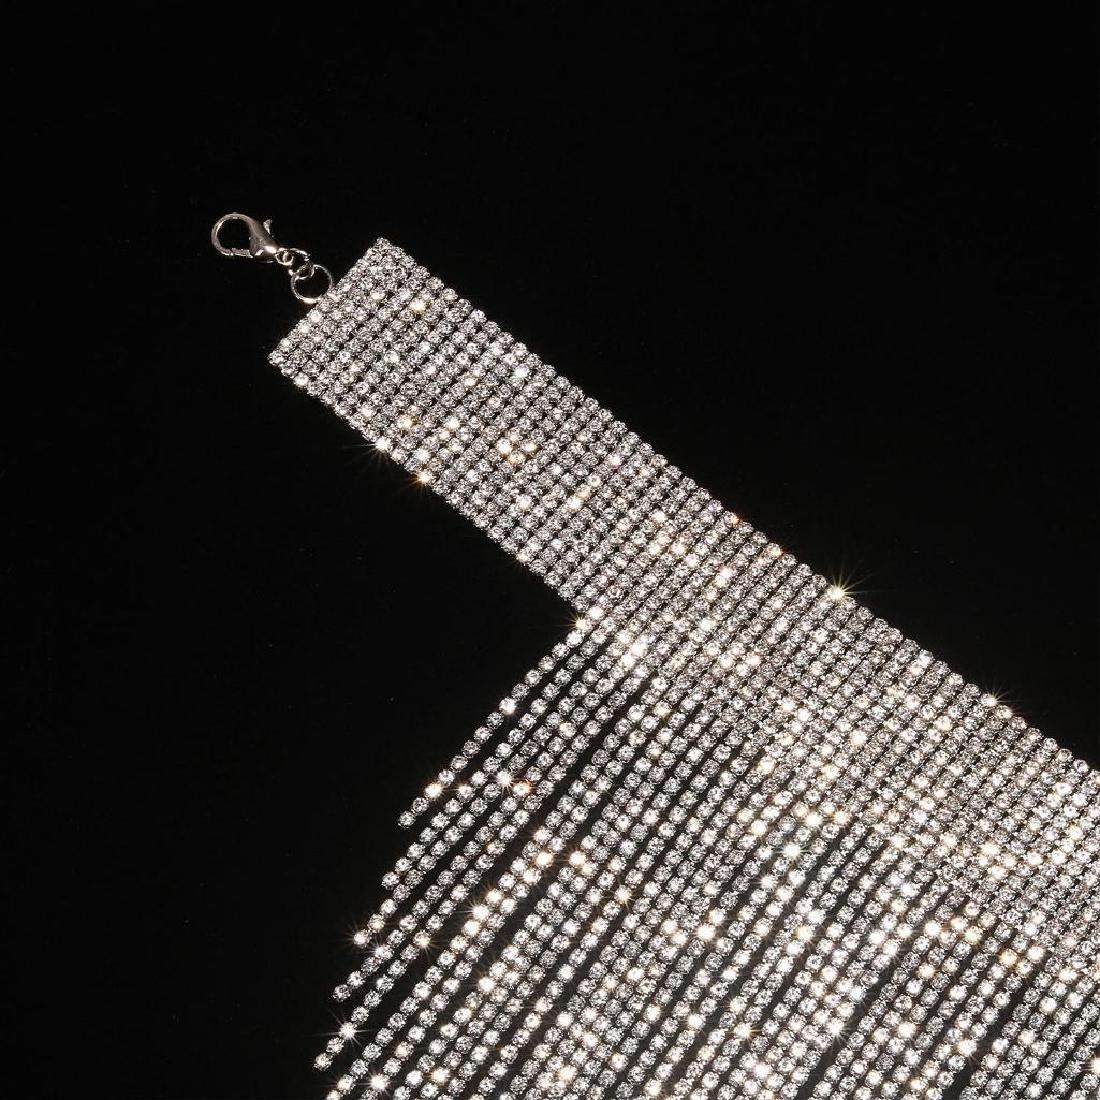 Holylove Charm Rhinestone Tassels Choker Collar Pendant - 4